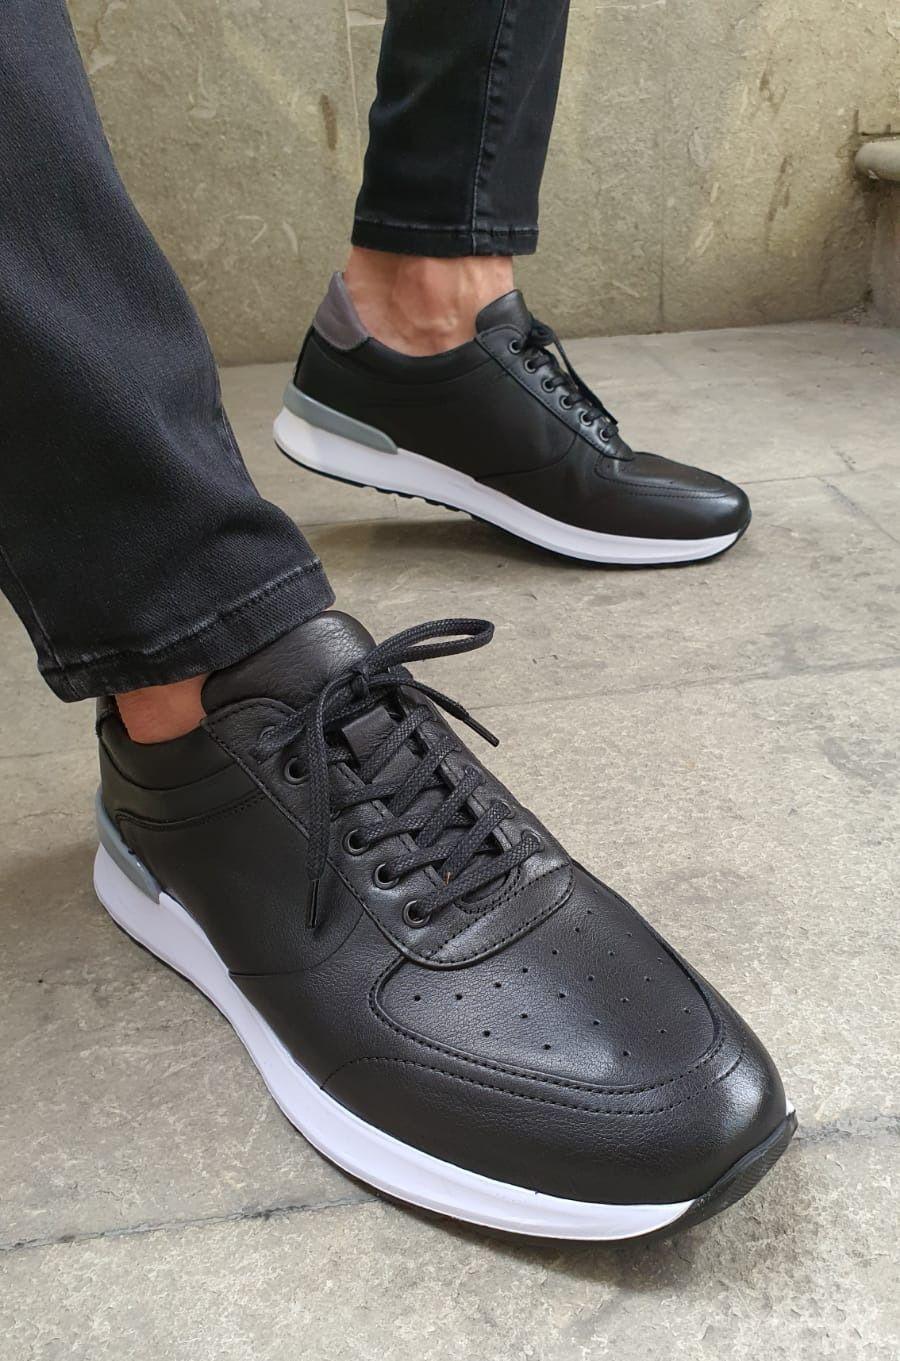 Buy Black Mid Top Sneakers By Gentwith Com With Free Shipping Mid Top Sneakers Sneakers Black Dress Shoes Men [ 1361 x 900 Pixel ]